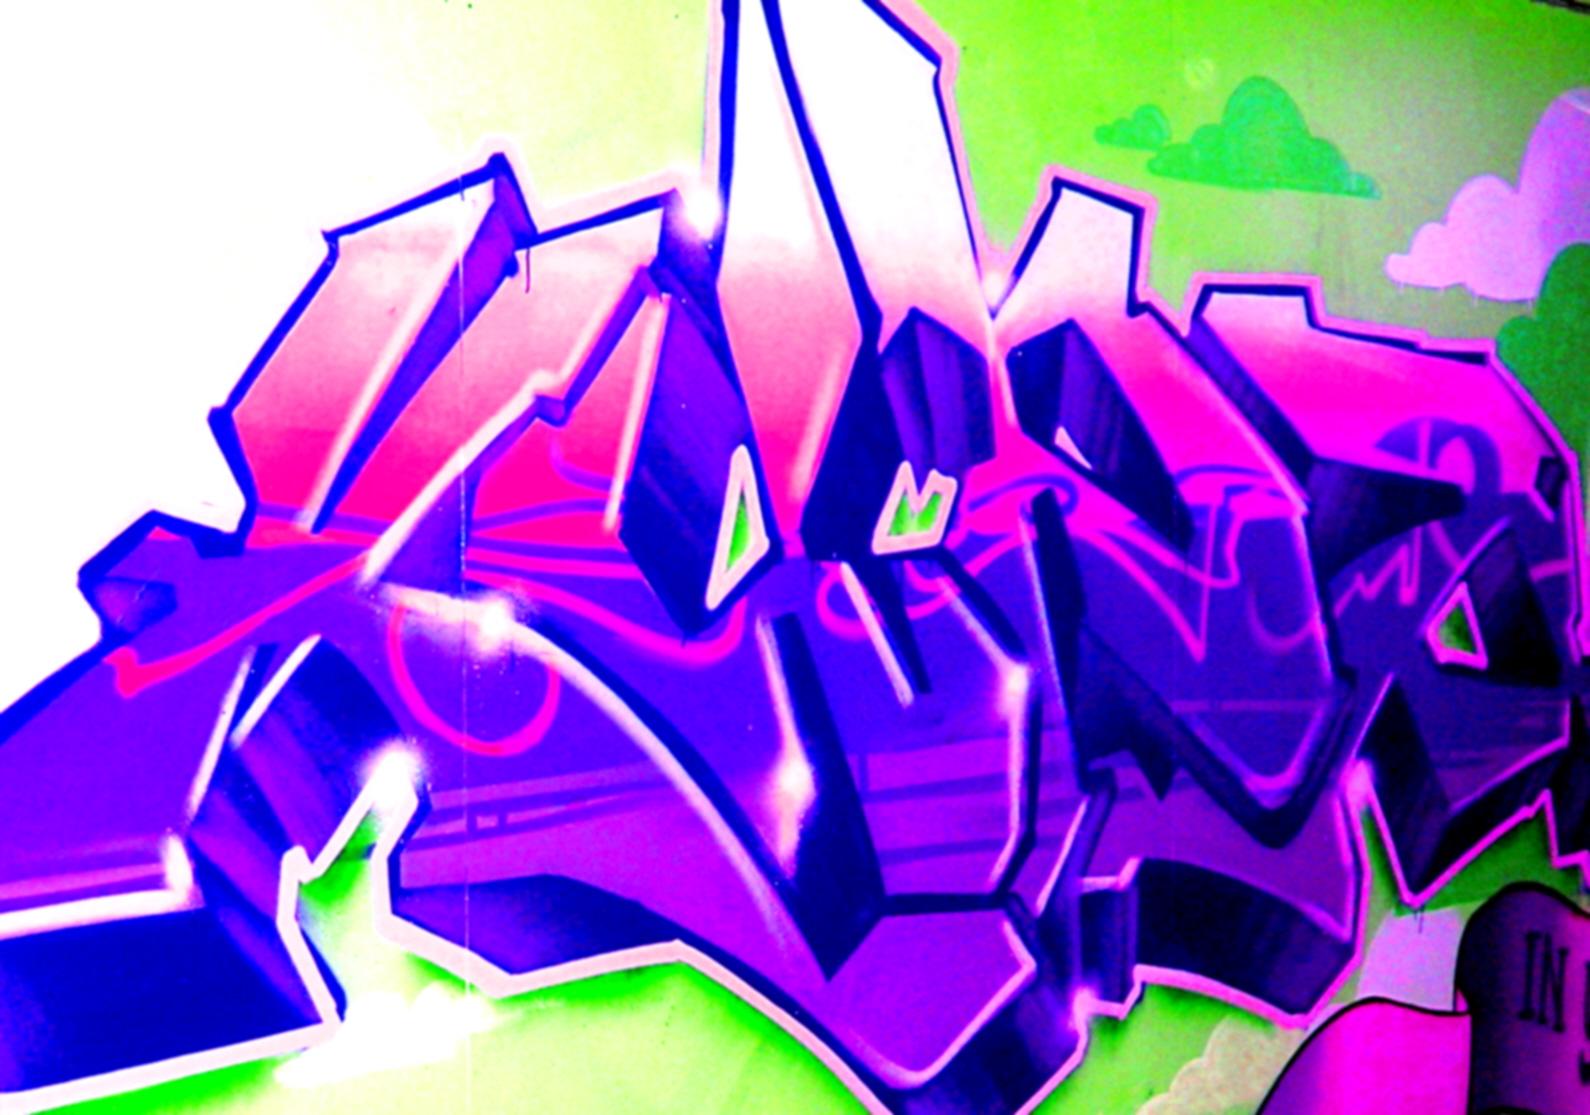 http://3.bp.blogspot.com/--oiuQnSXf4o/UCIMRHEE7hI/AAAAAAAAAfk/m6fDkXHtxII/s1600/wallpaper_11363.jpg